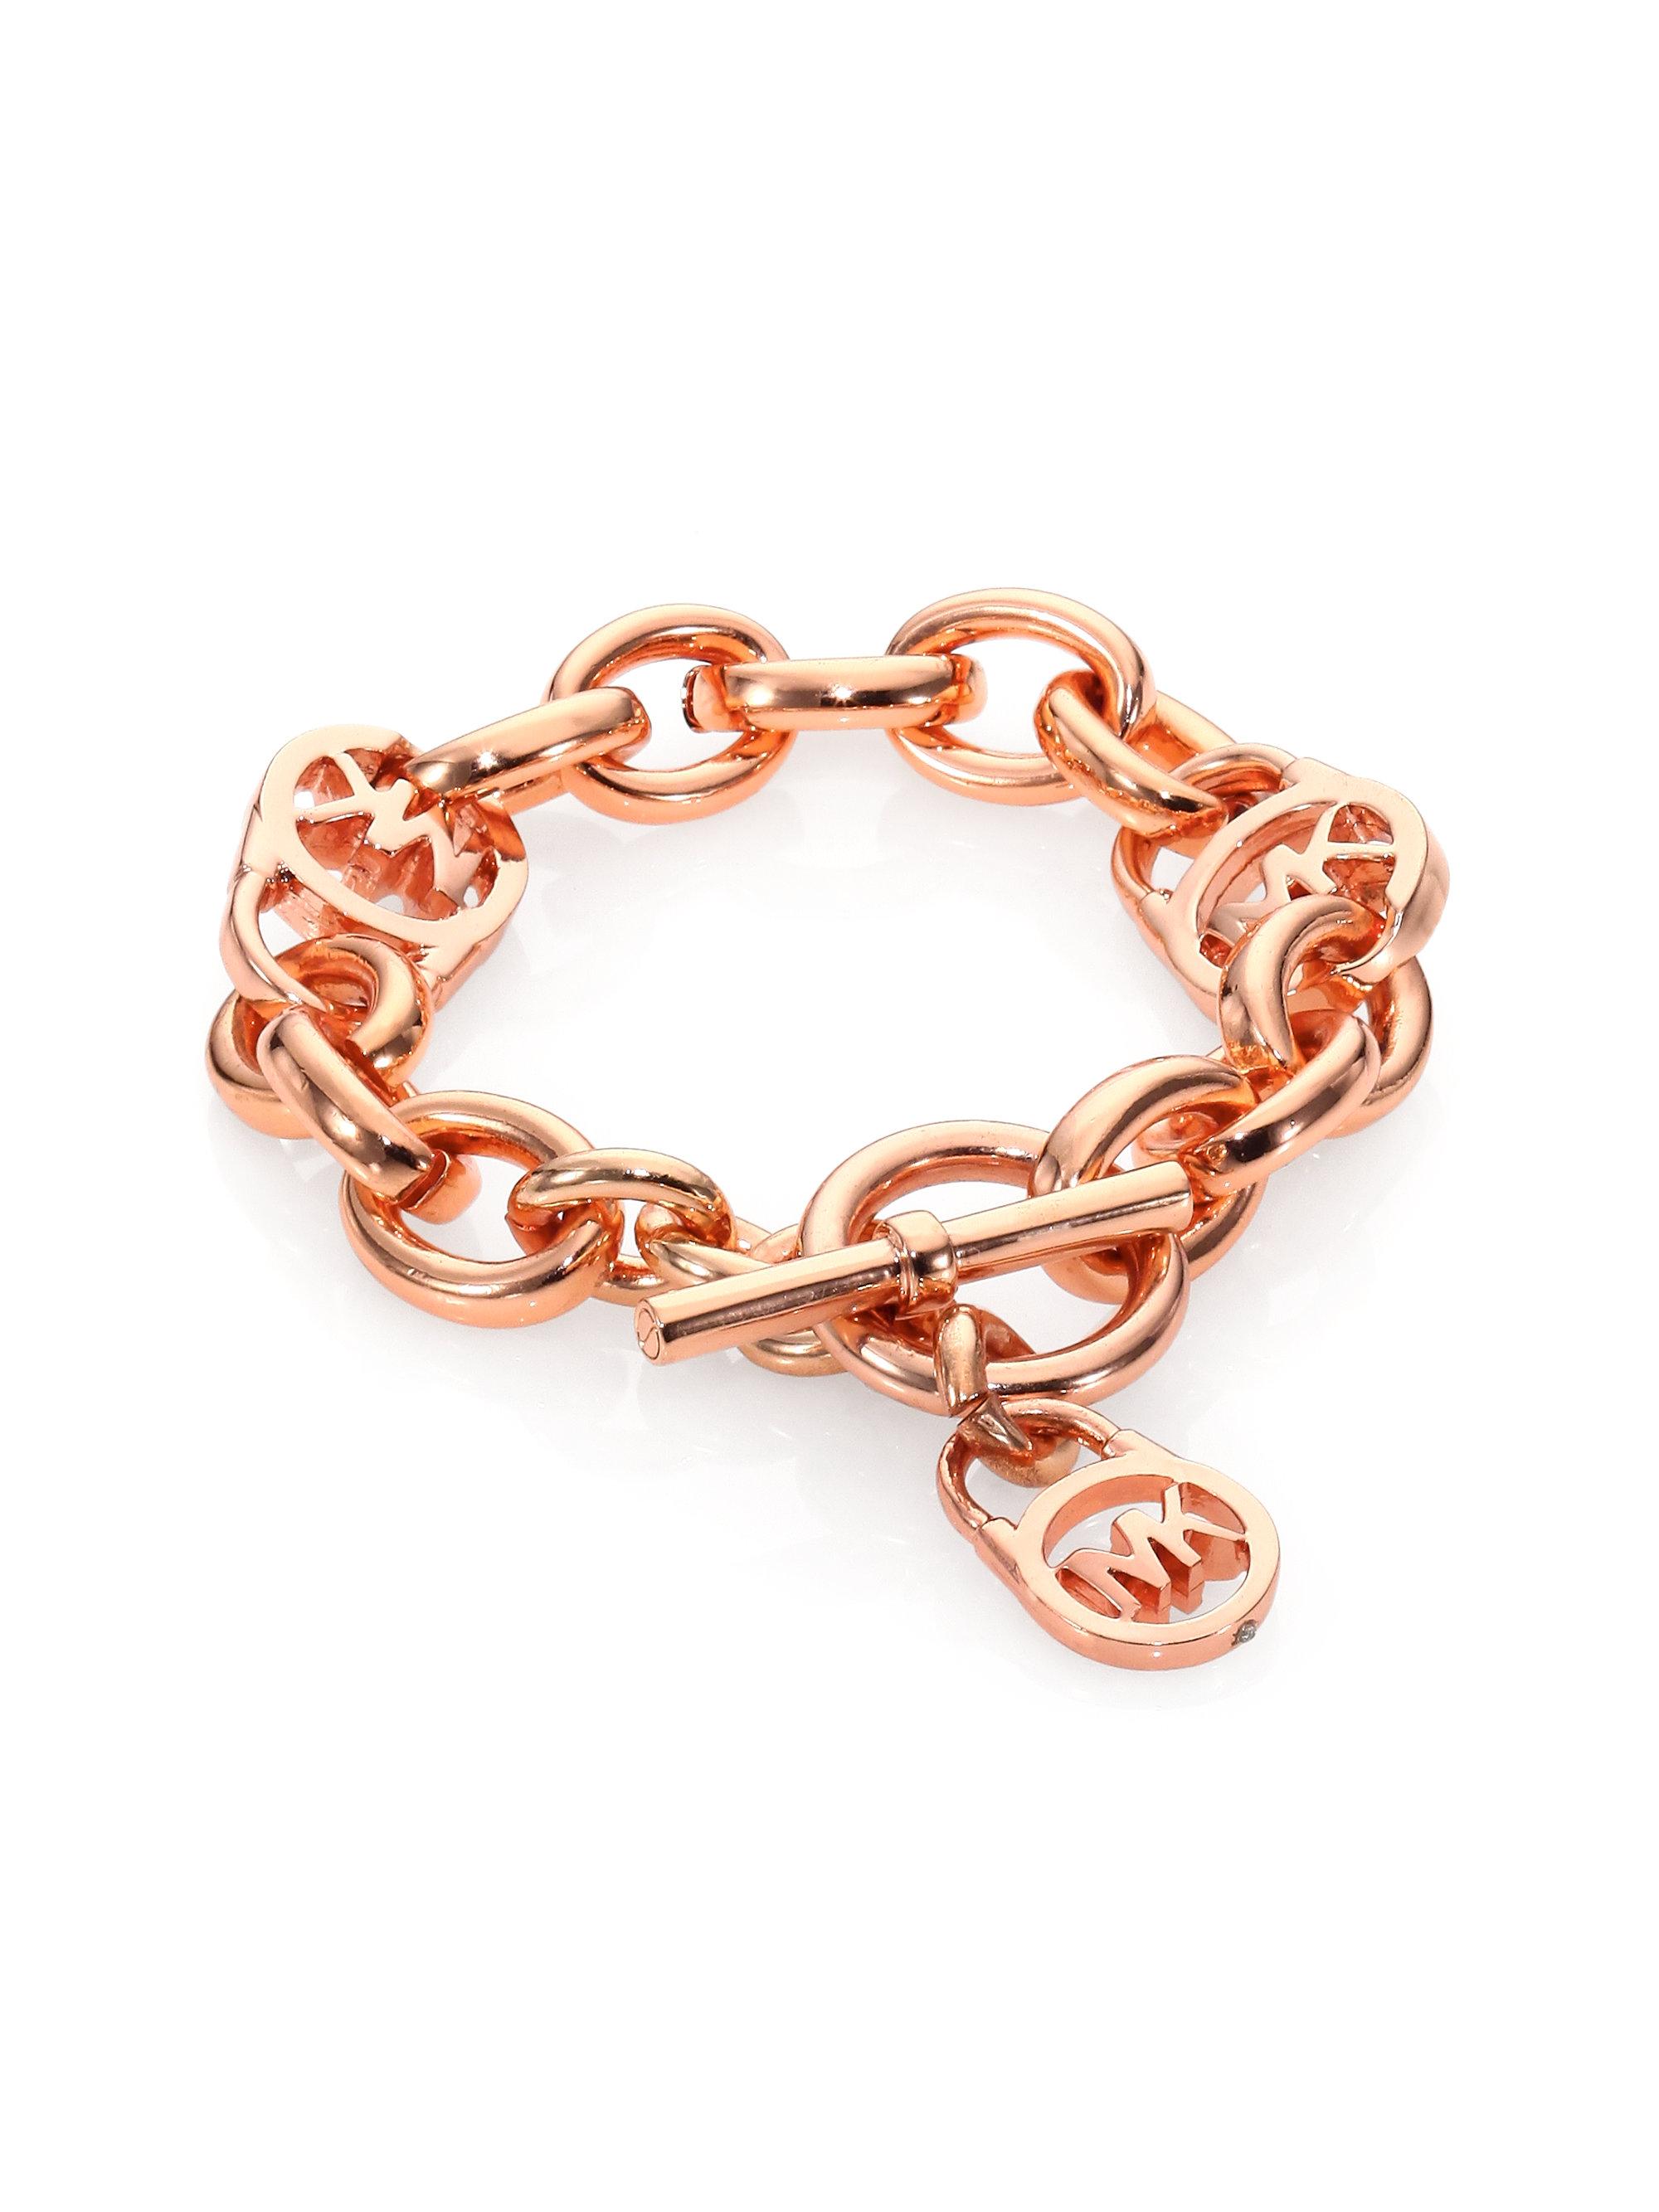 michael kors heritage fulton padlock charm toggle bracelet